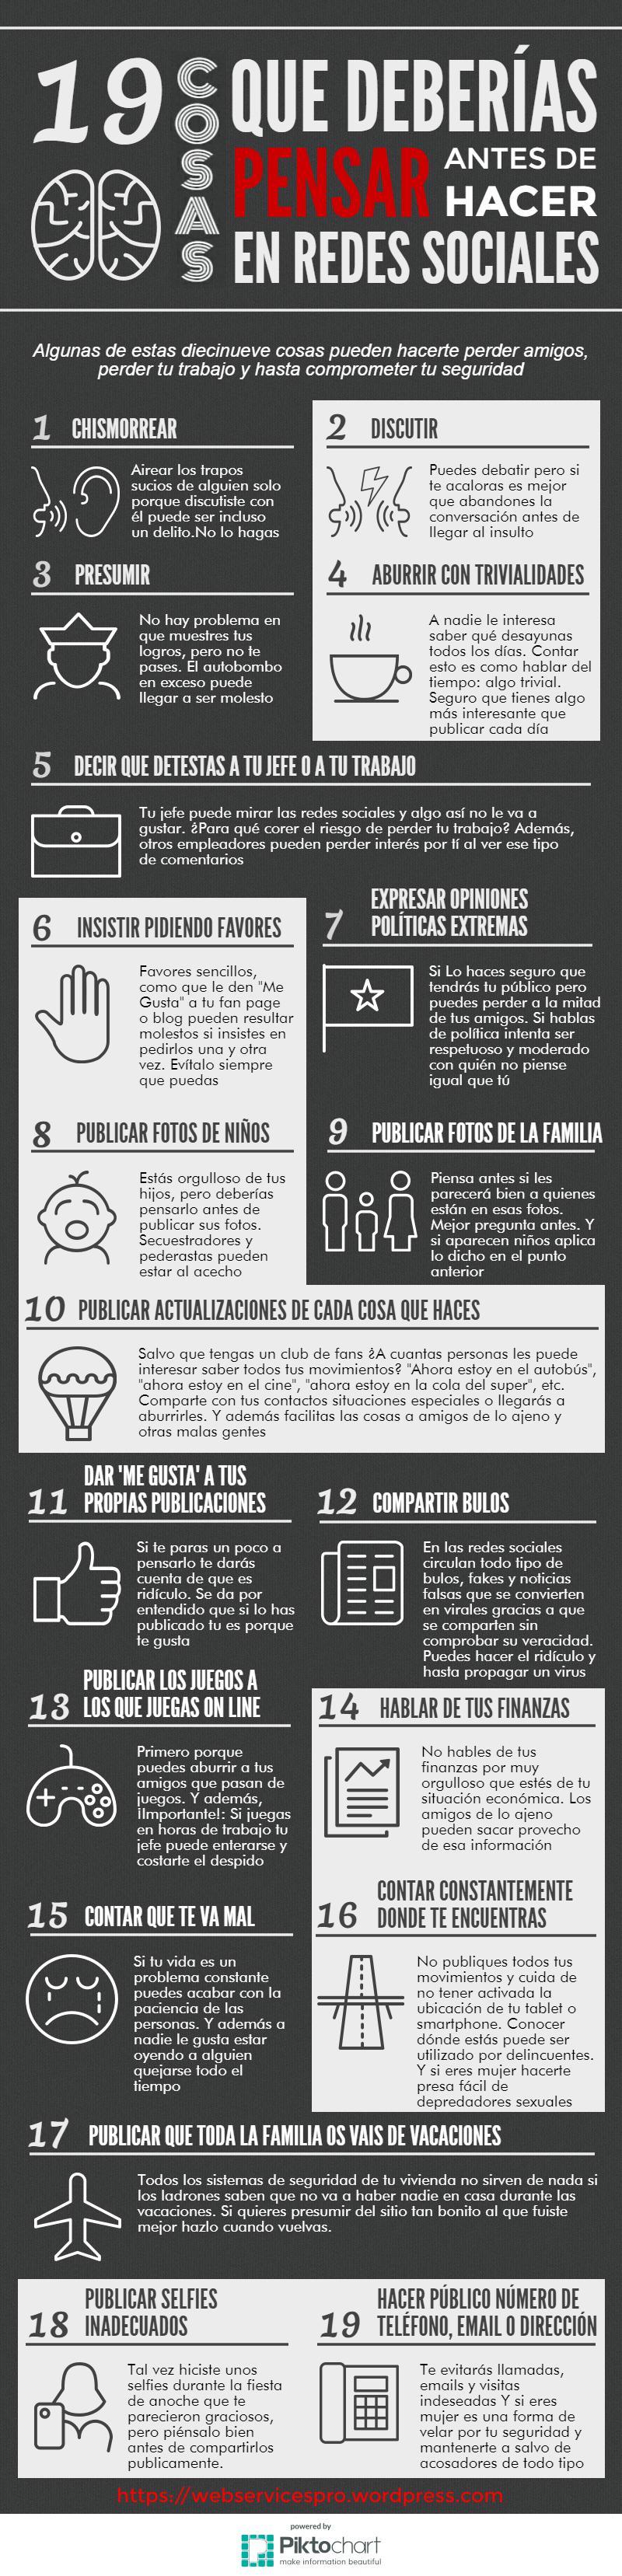 19 Cosas que deberías pensar antes de hacer en redes sociales #infografia #socialmedia